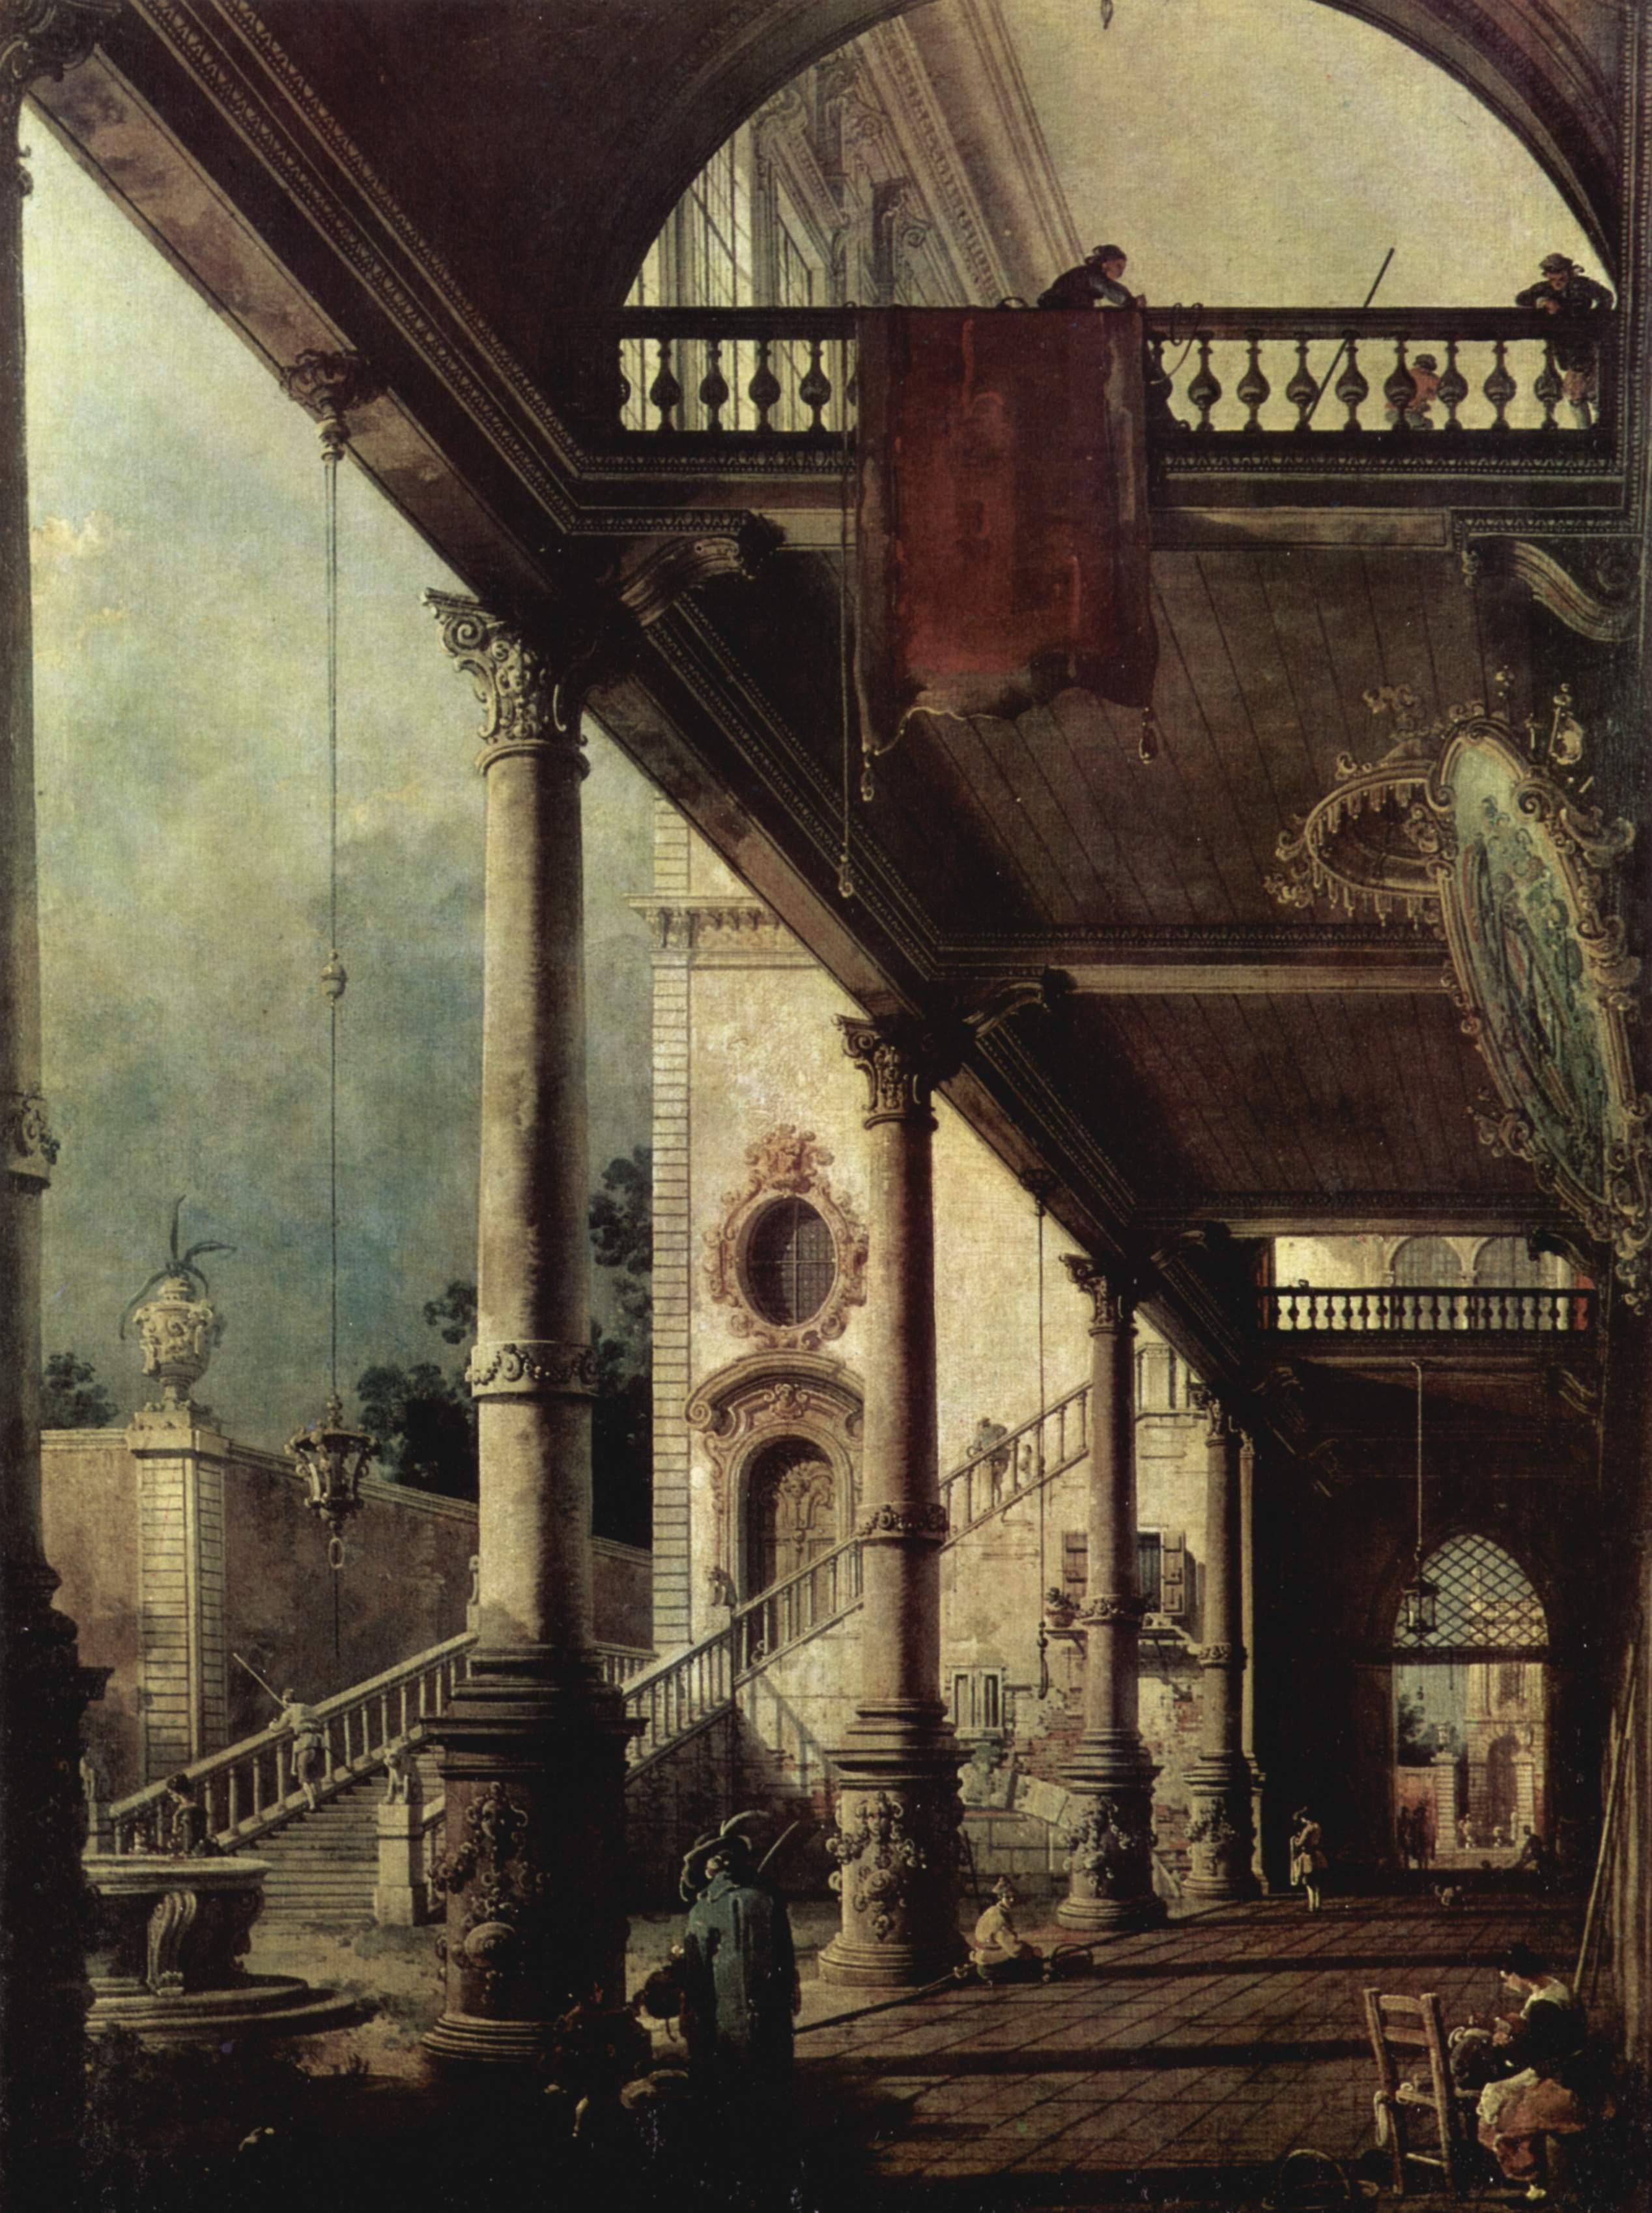 http://upload.wikimedia.org/wikipedia/commons/e/e6/Francesco_Guardi_025.jpg